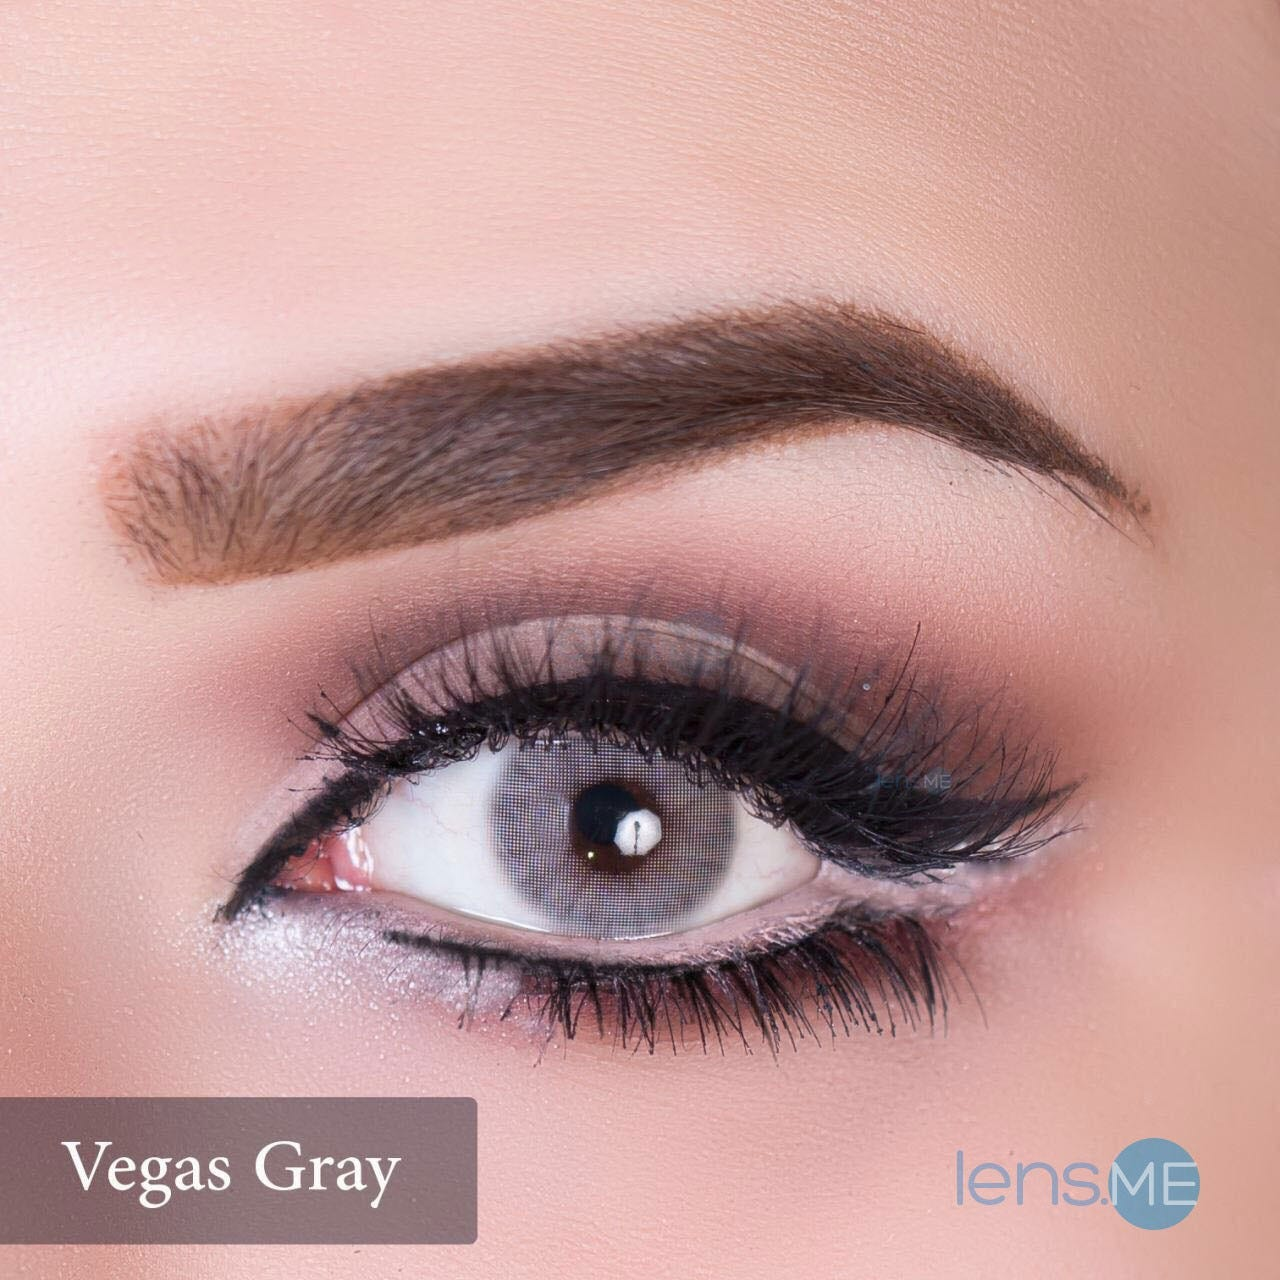 Anesthesia Vegas Gray | 2 contact lenses | USA, UAE, UK ...